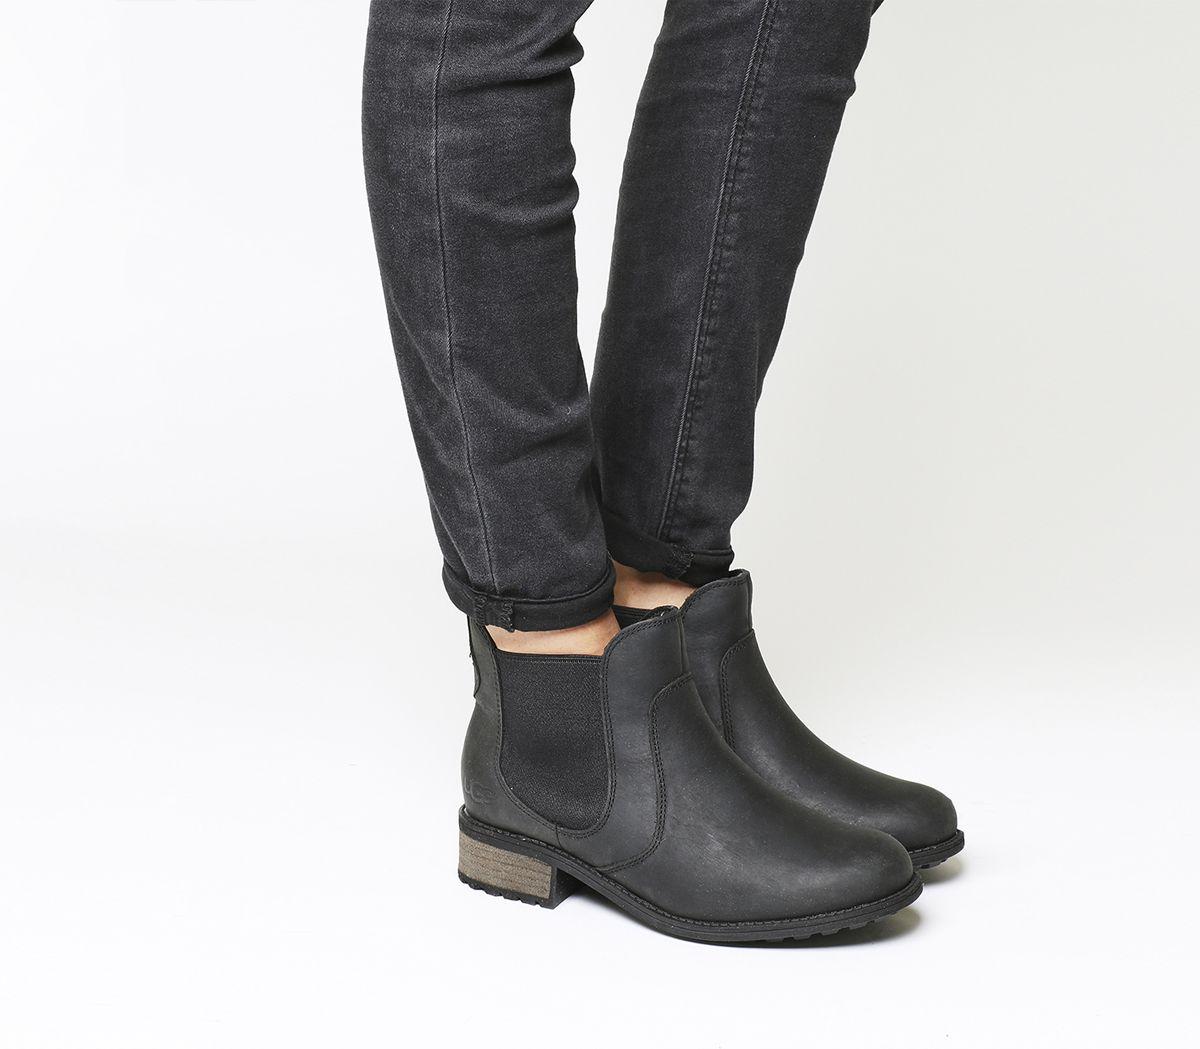 8206a1a5ea8 Bonham Chelsea Boots